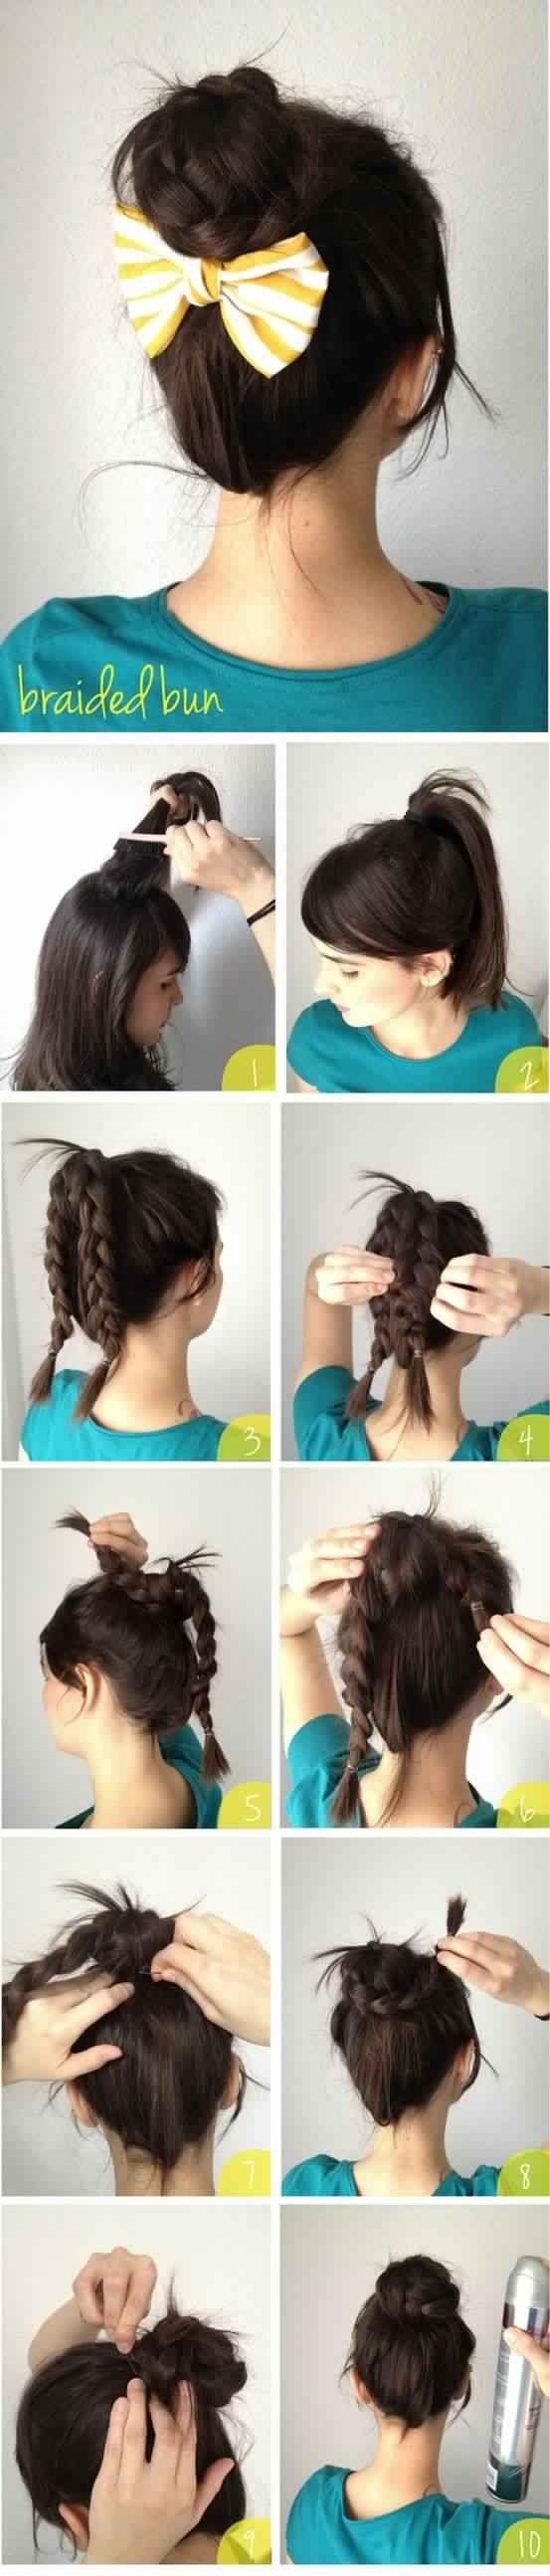 hair-do #updo #do